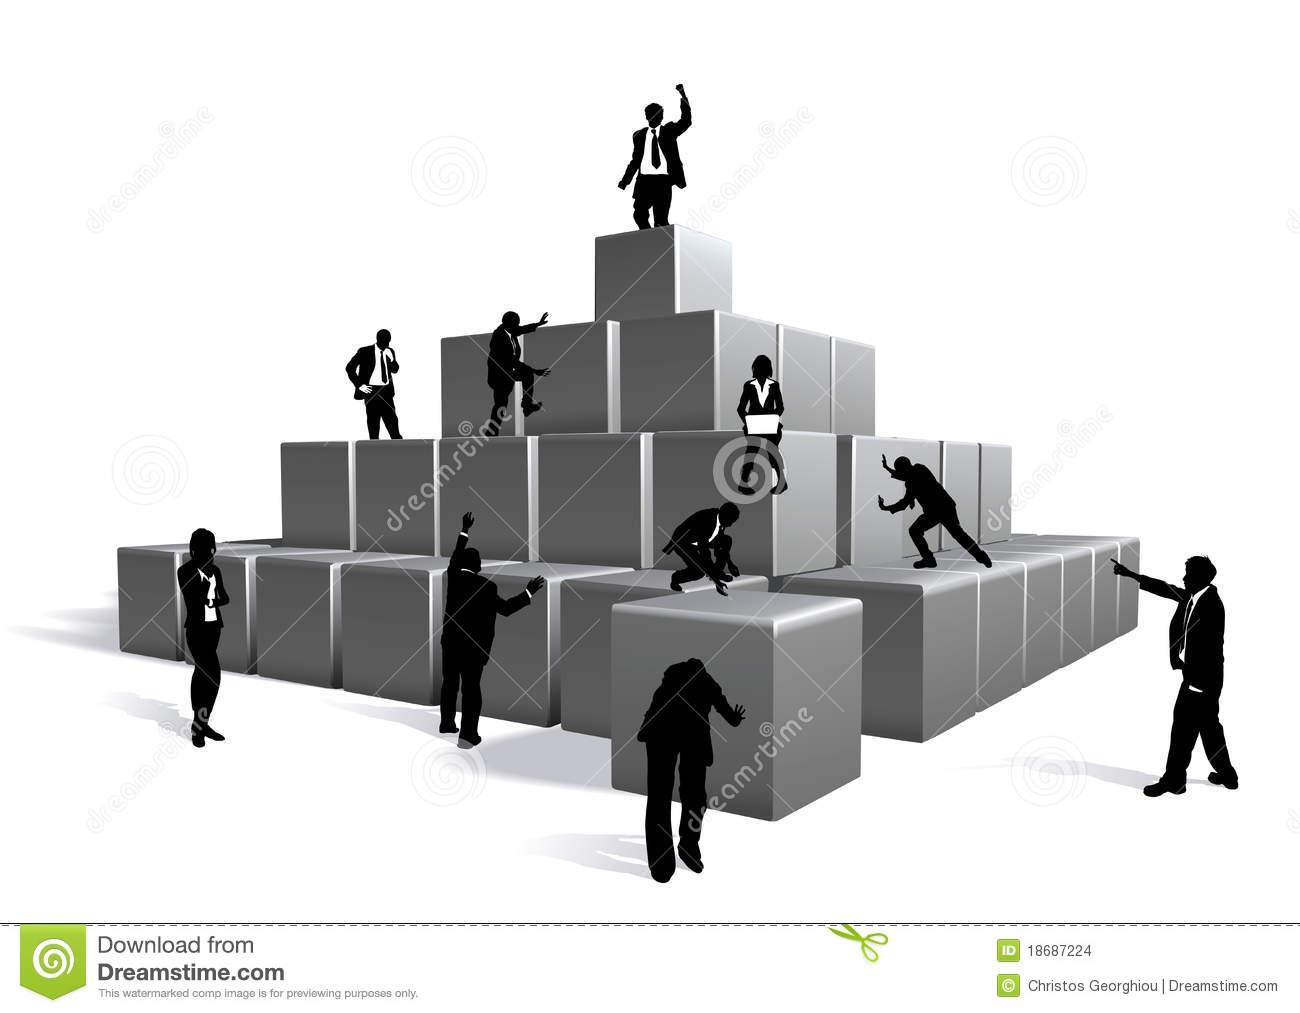 Business building blocks clipart jpg freeuse library Business Building Blocks Stock Image - Image: 2340941 jpg freeuse library